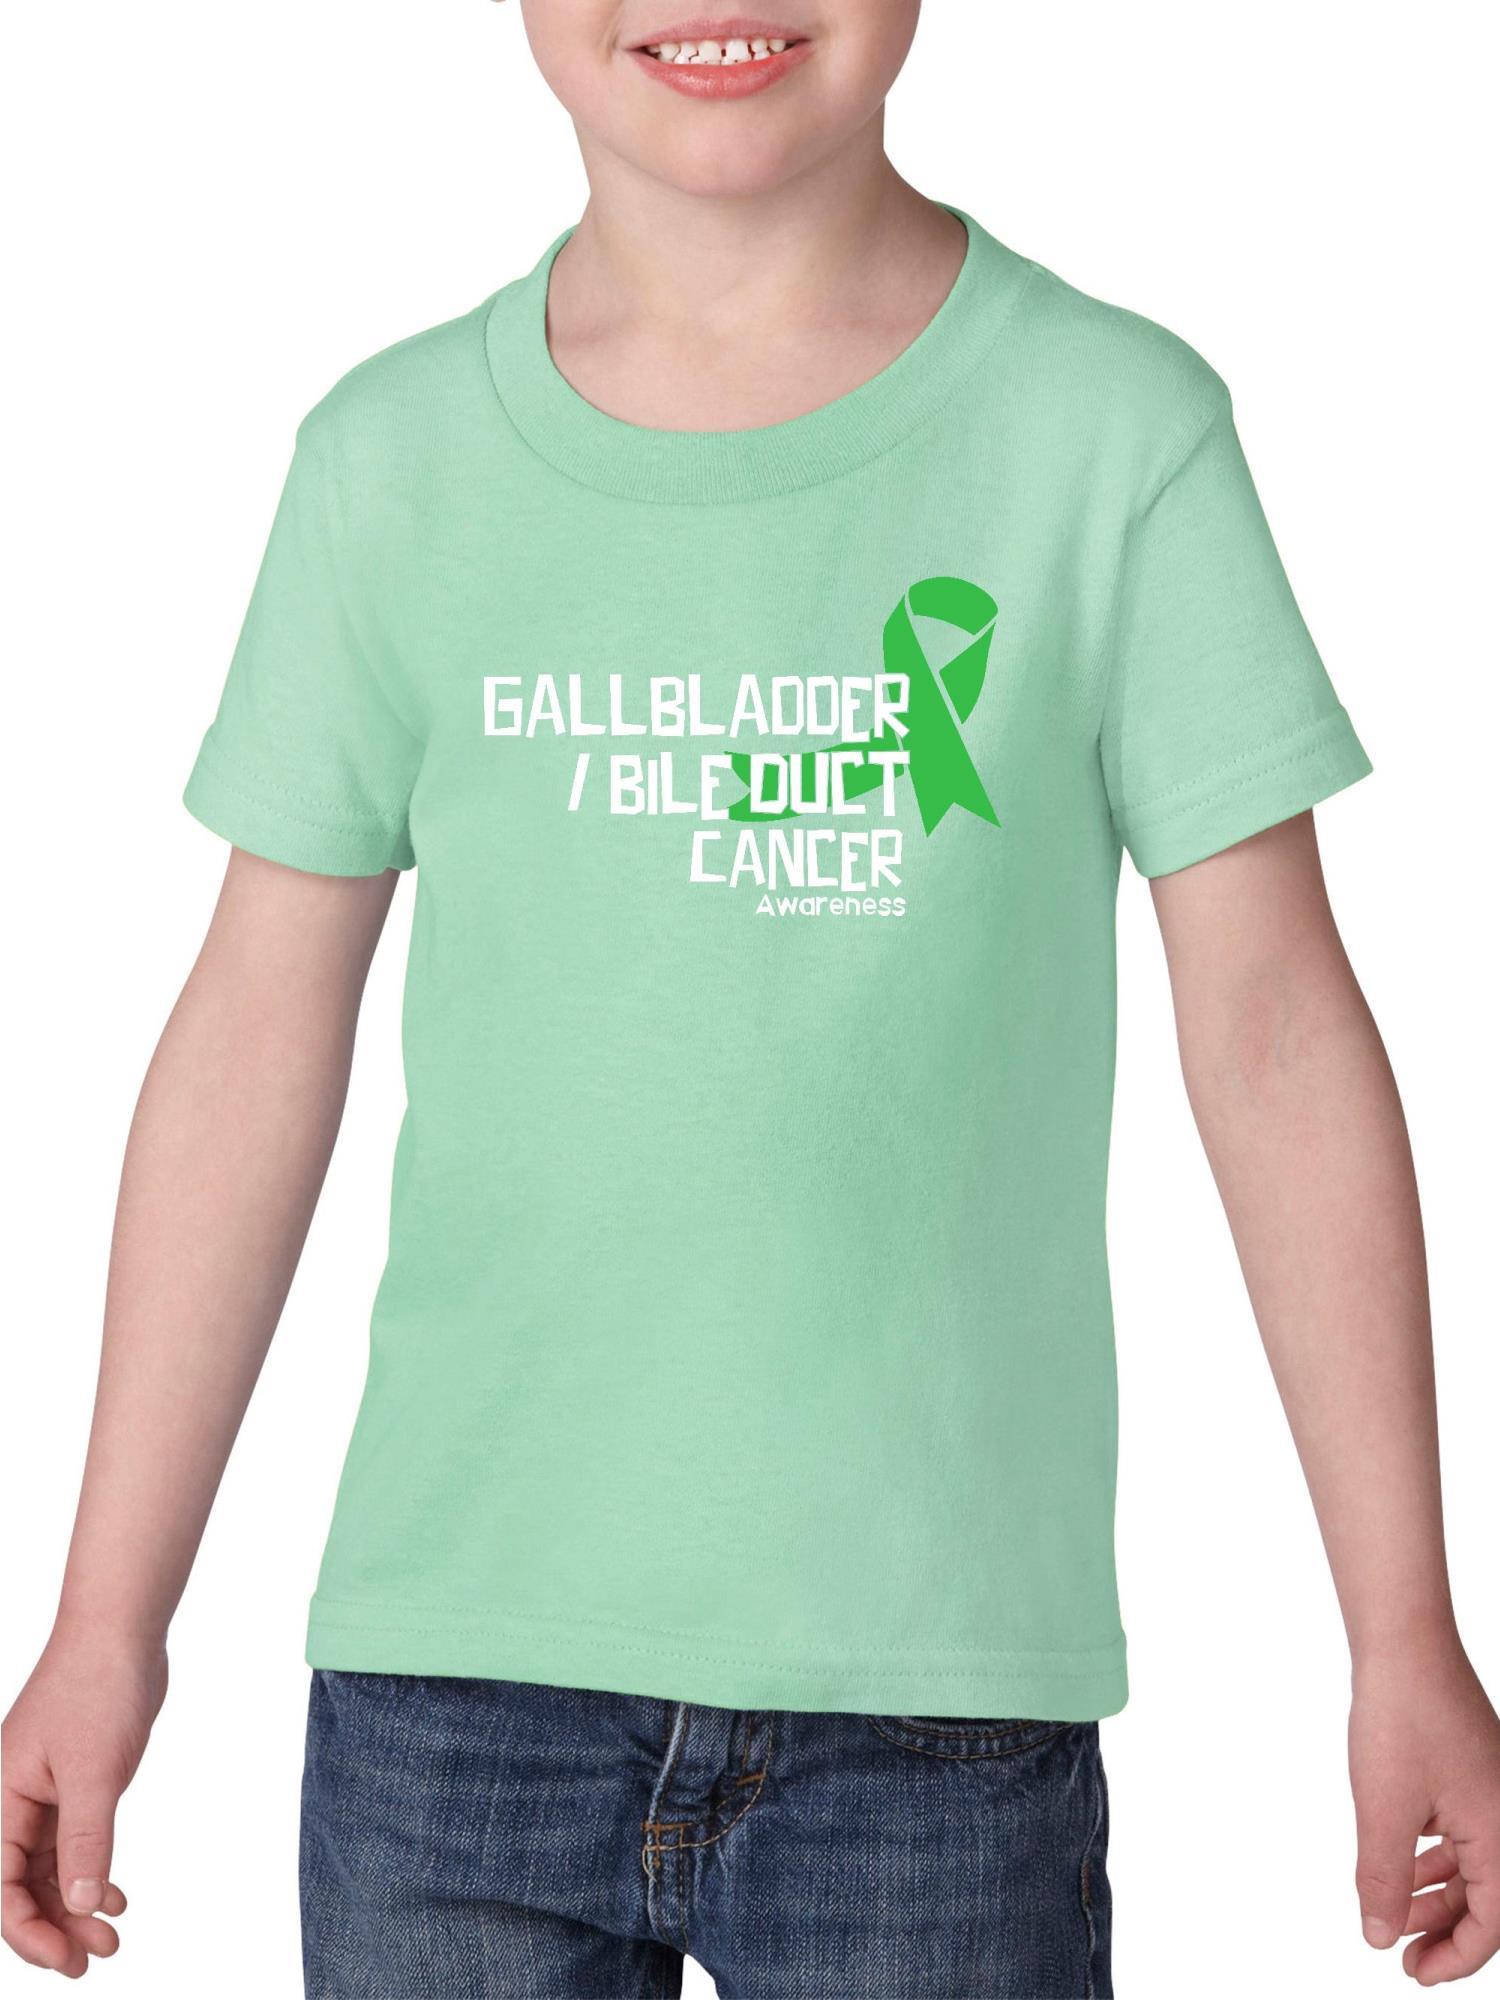 Gallbladder Bile Duct Cancer Awareness Heavy Cotton Toddler Kids T-Shirt Tee Clothing